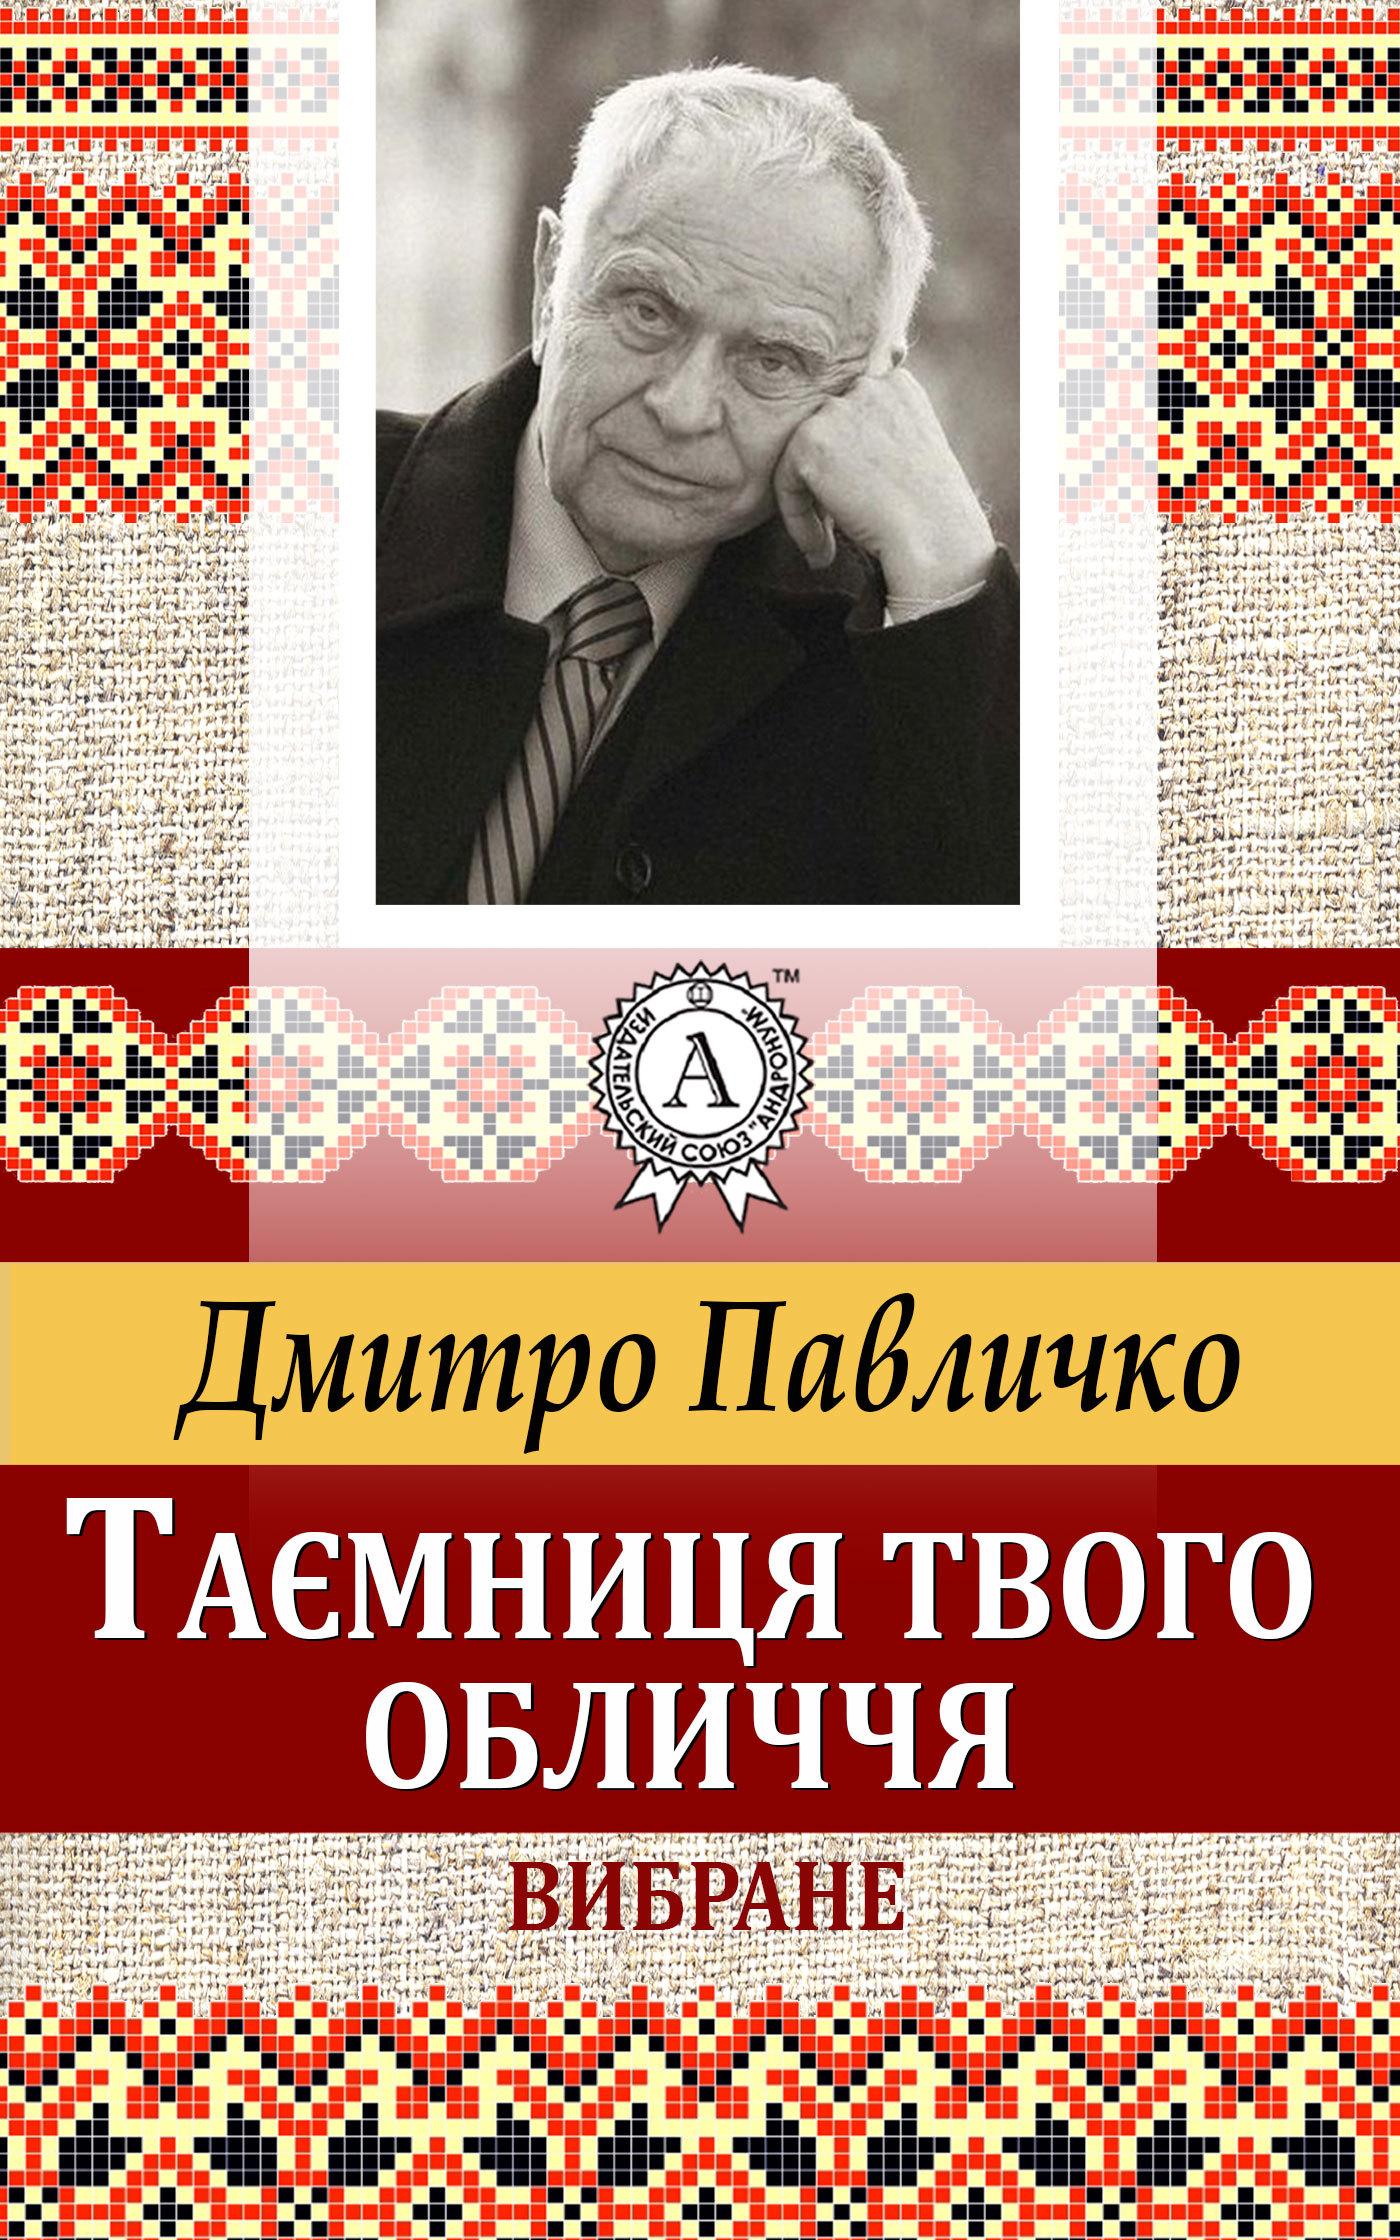 Дмитро Павличко бесплатно